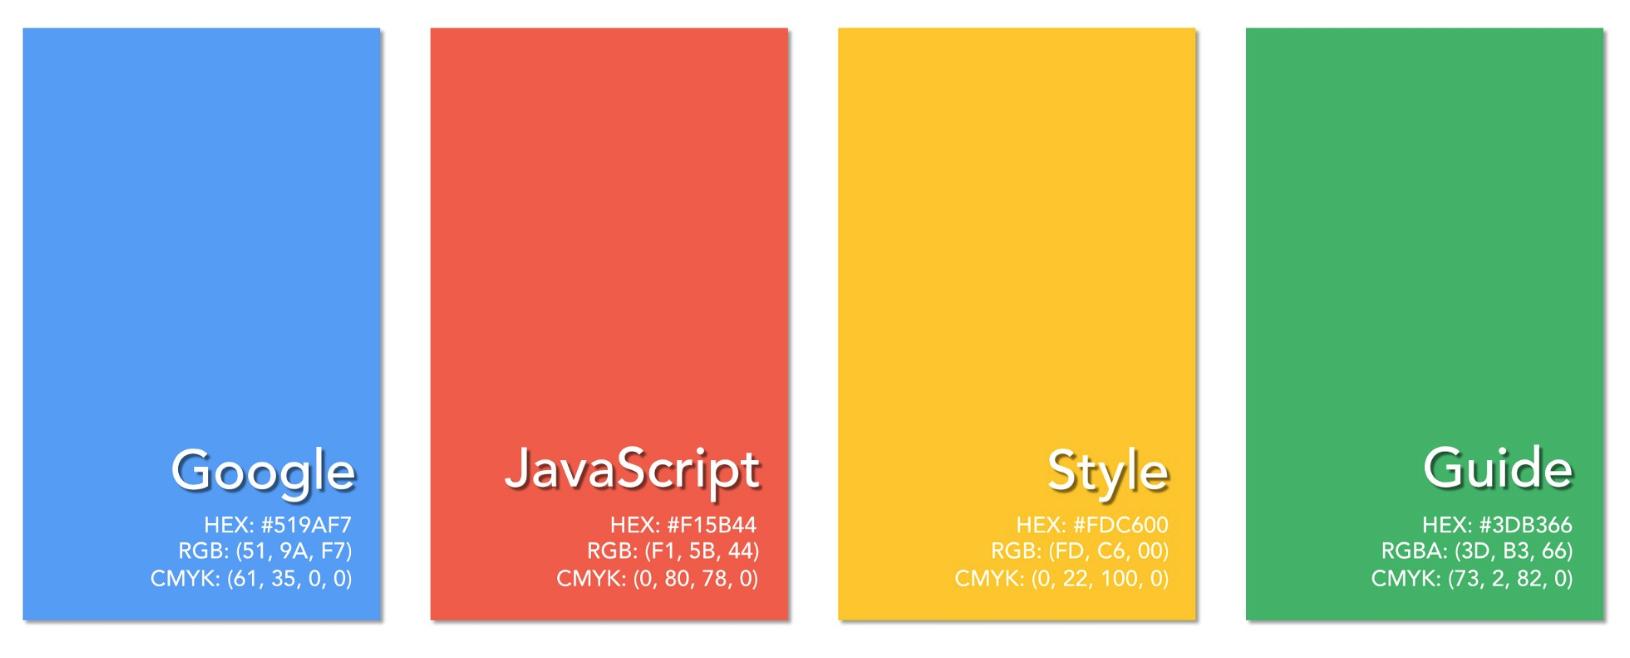 Google JavaScript Styleguide